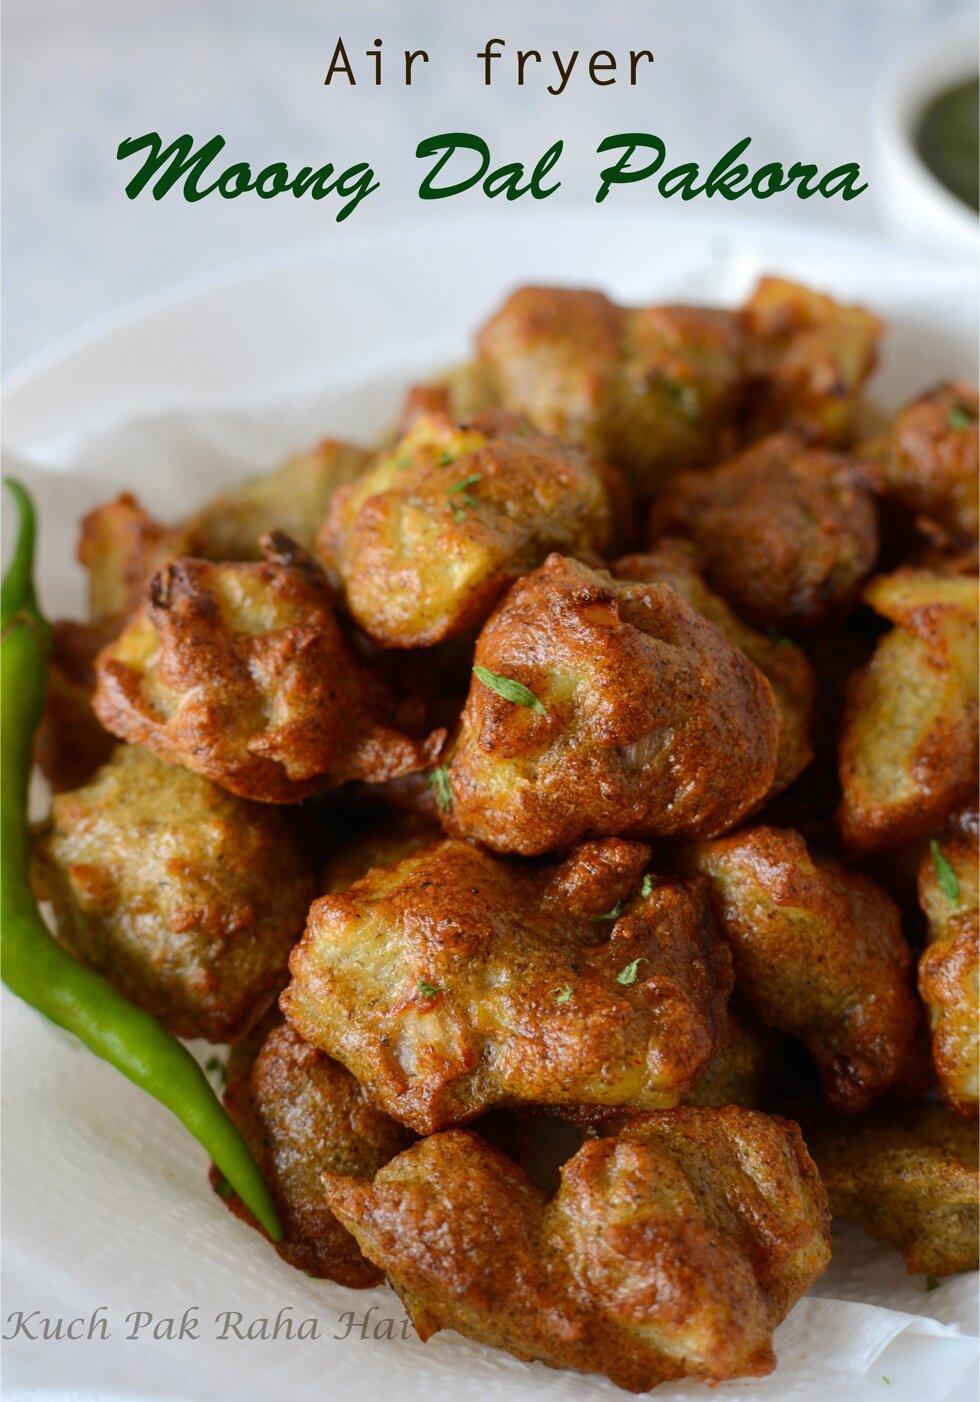 Moong Dal Pakora in air fryer mung dal pakode lentil fritters recipe high protein low fat